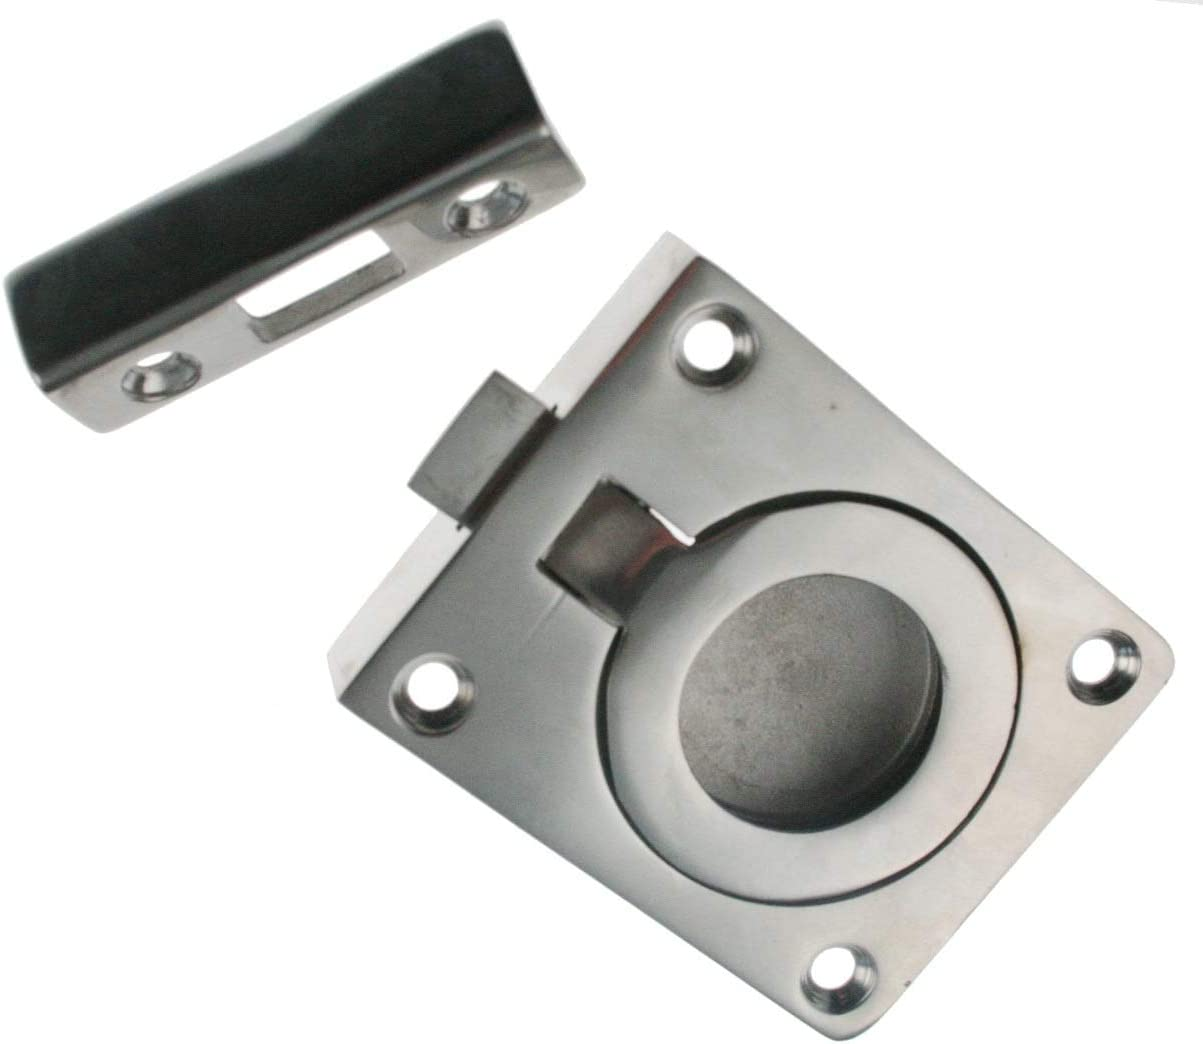 ARBO-INOX 007100 Bodenheber mit Schloss Verschluss Edelstahl 45mm